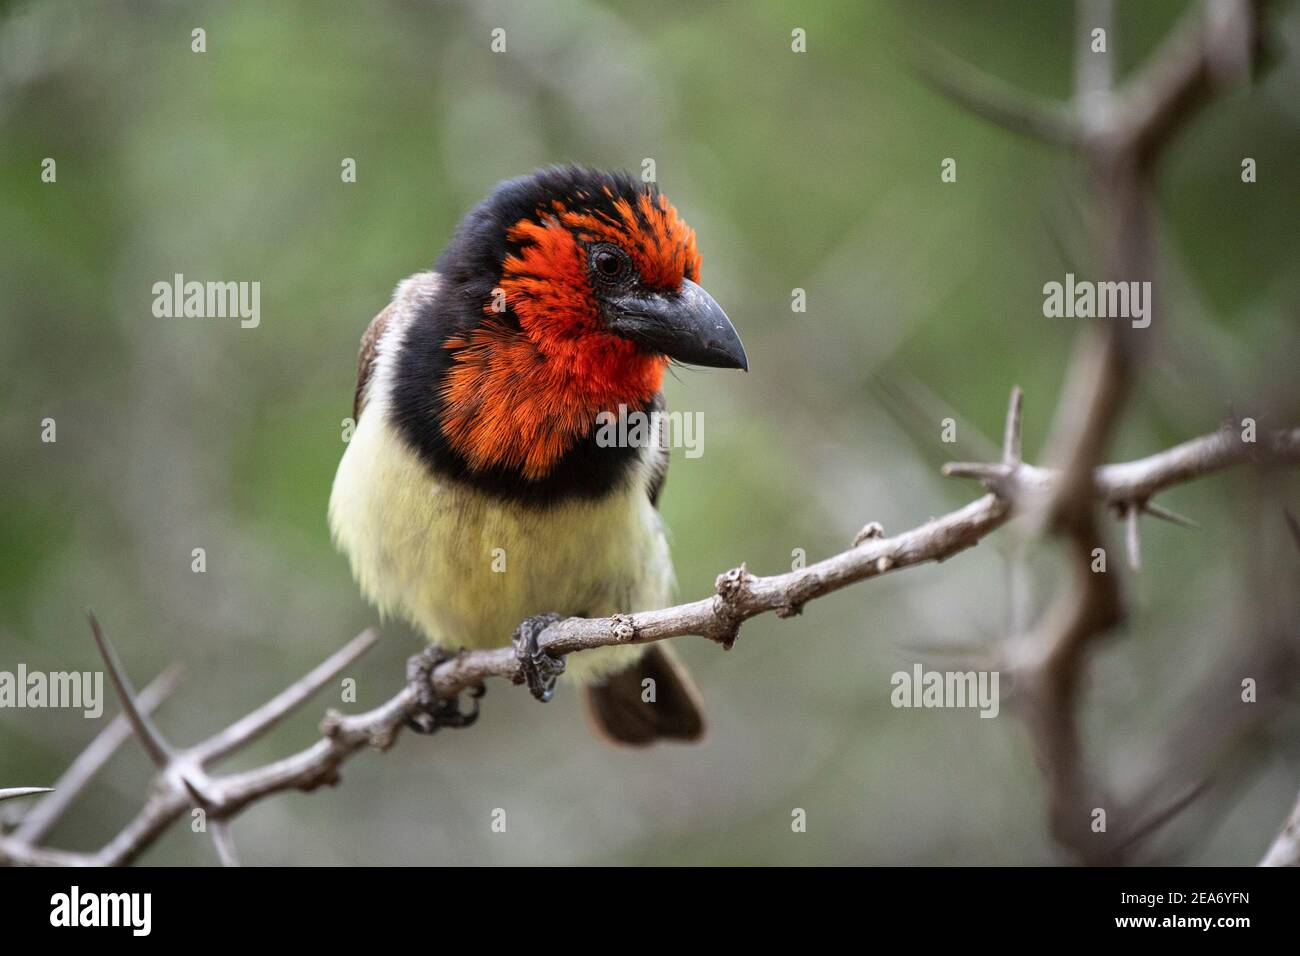 Black-collared barbet, Lybius torquatus, Kruger National Park, South Africa Stock Photo